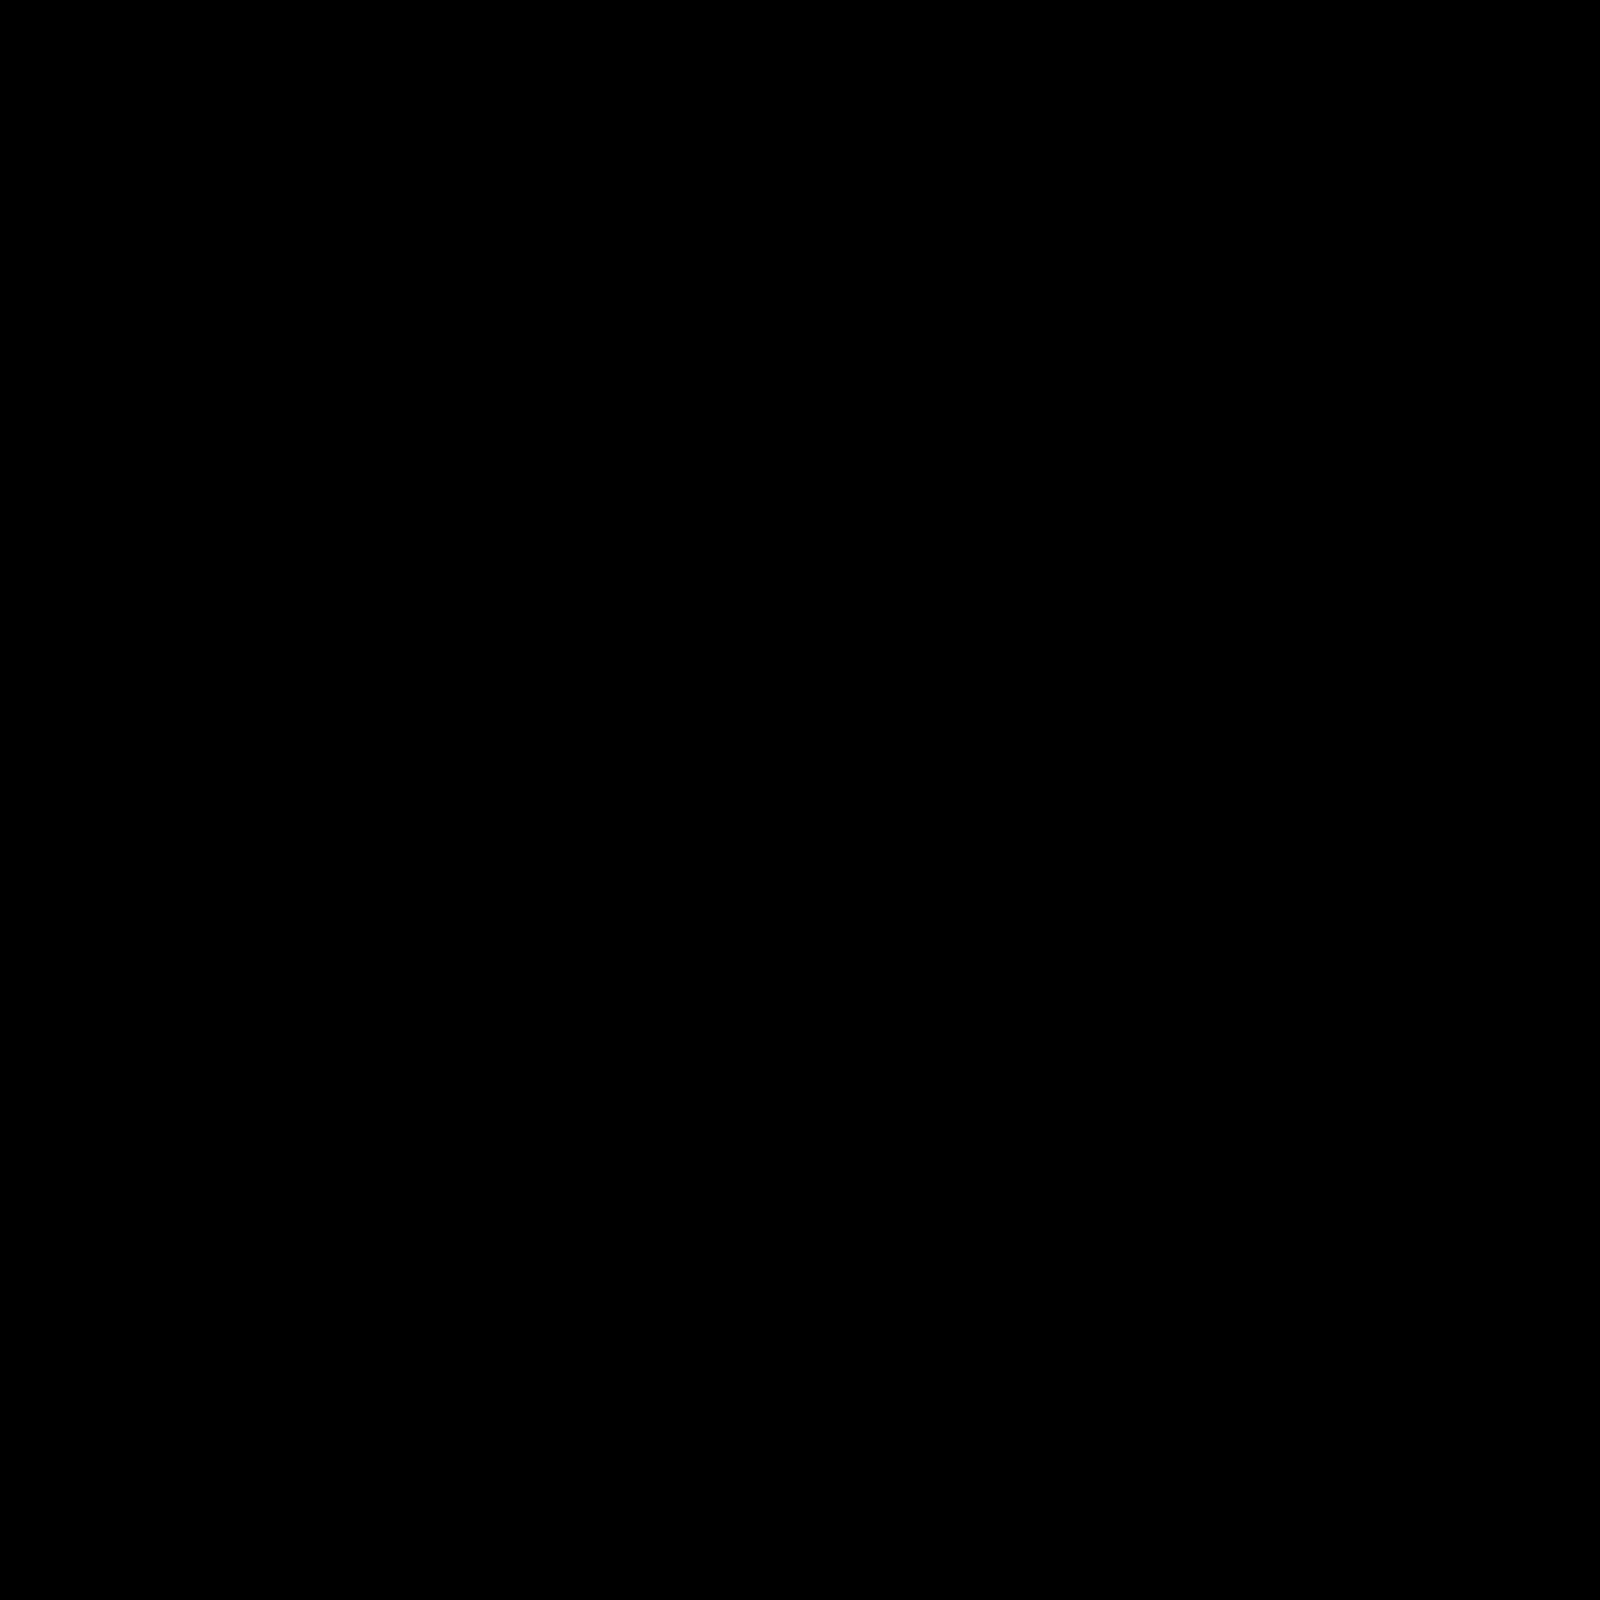 Kitchen Light icon